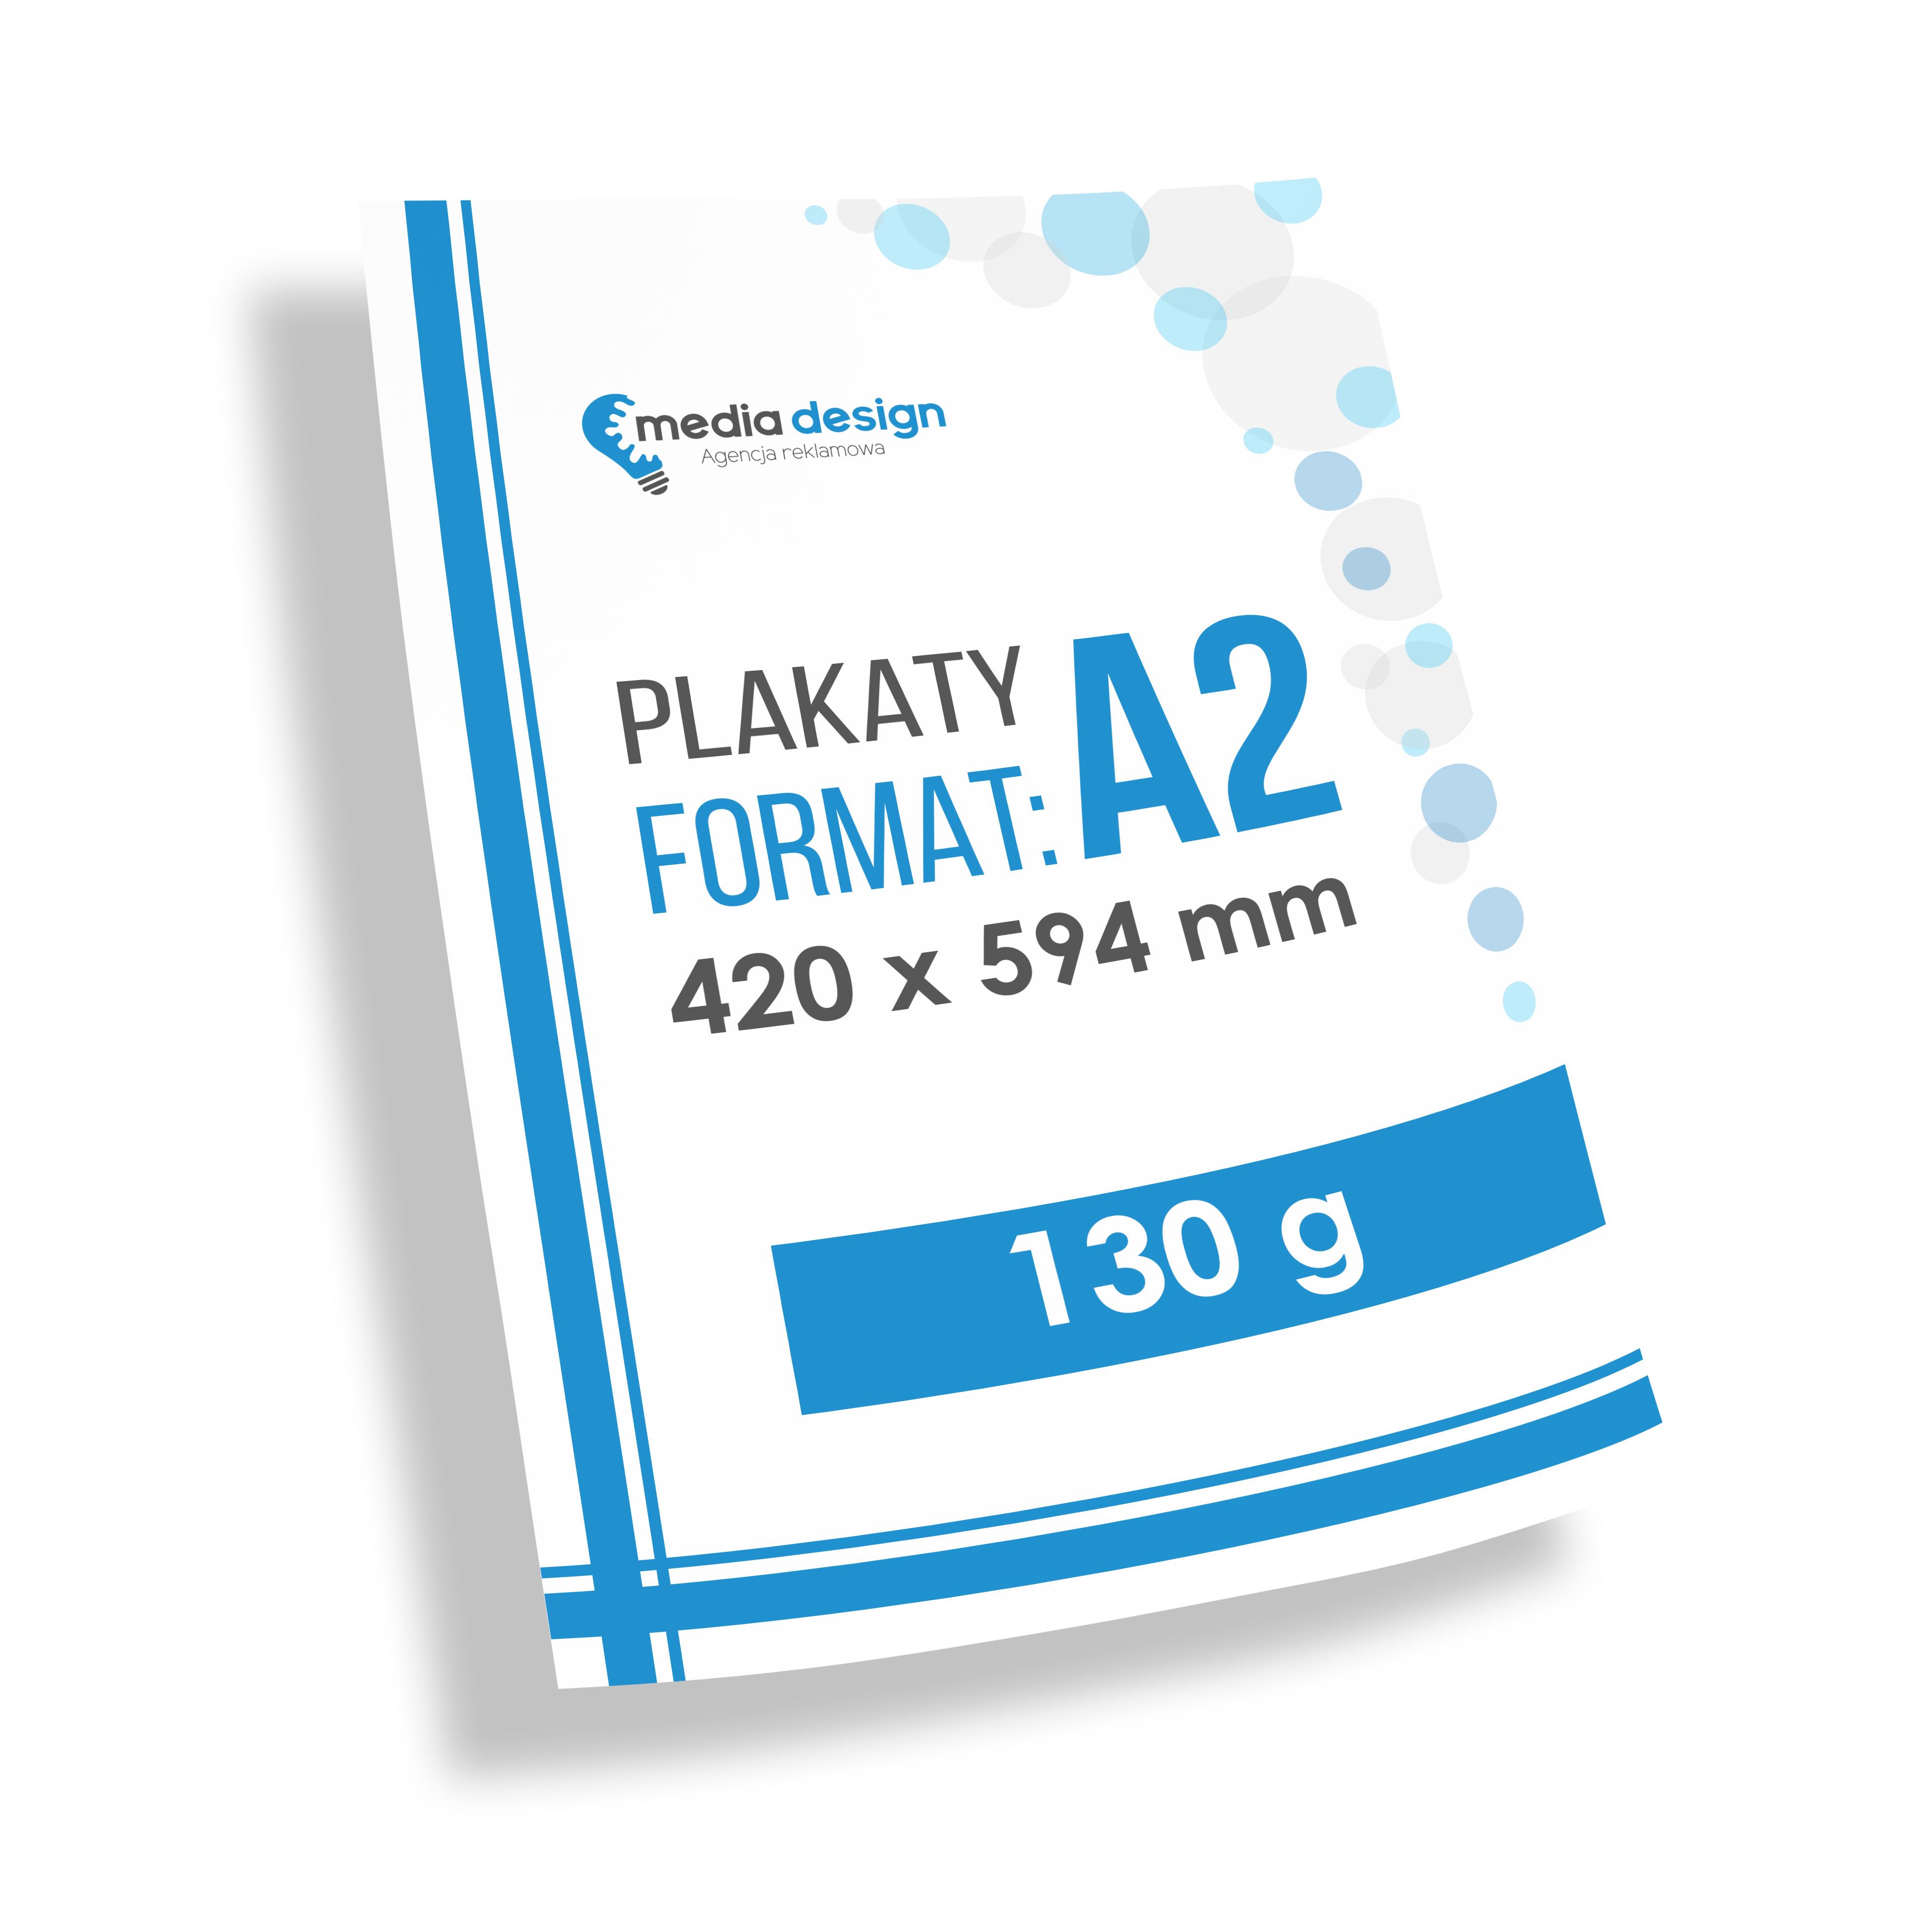 Plakaty A2 (420x594 mm) - 130g